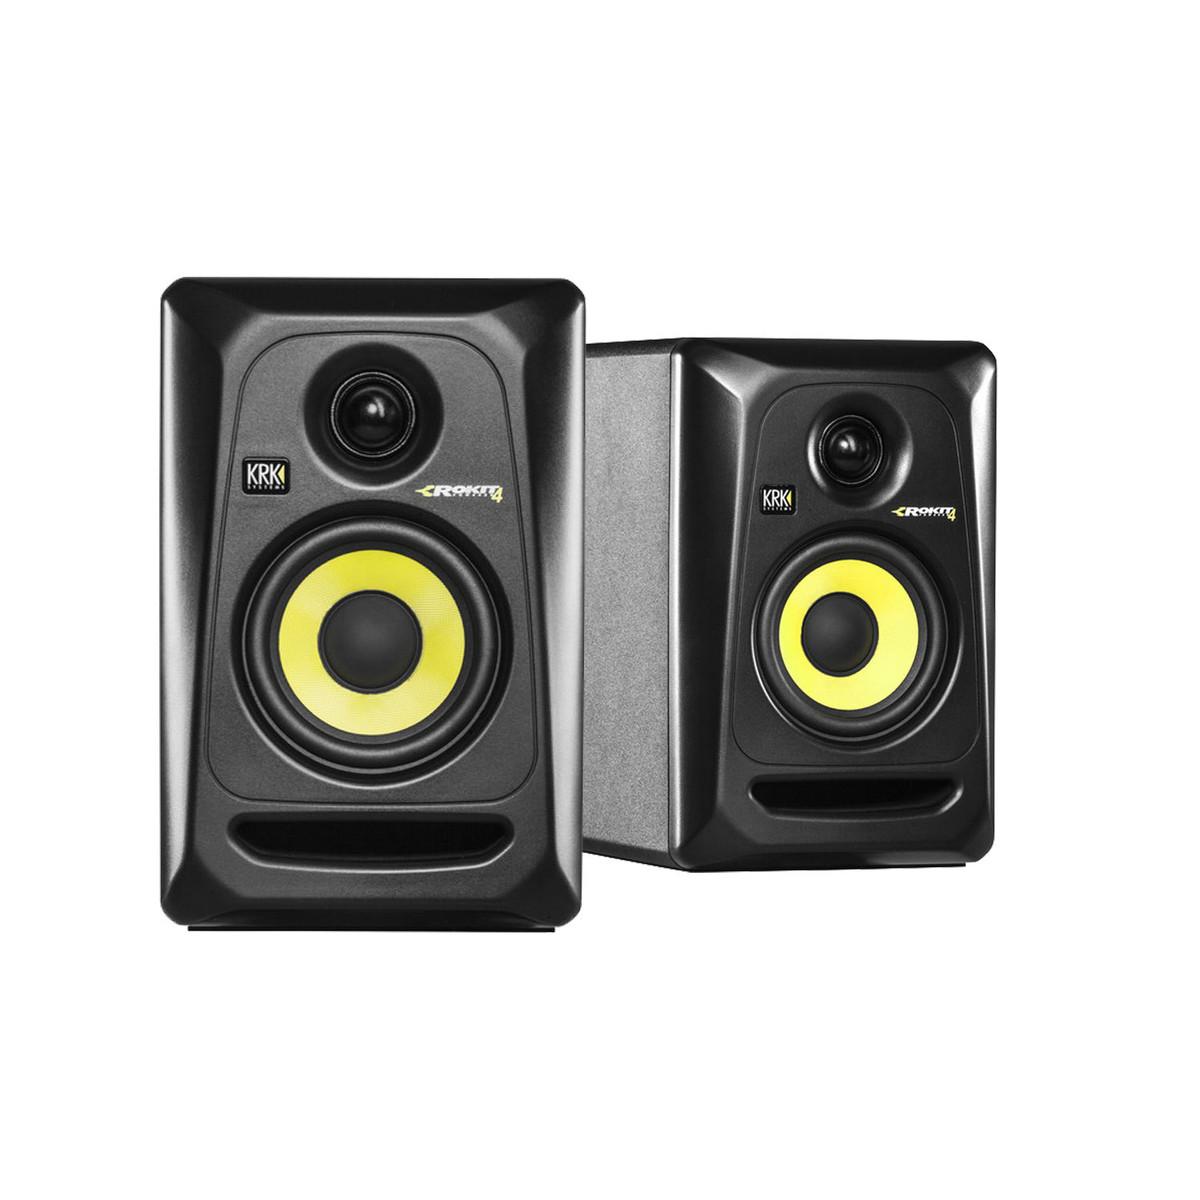 krk rokit rp4 g3 studio monitors with desktop stands pair at gear4music. Black Bedroom Furniture Sets. Home Design Ideas